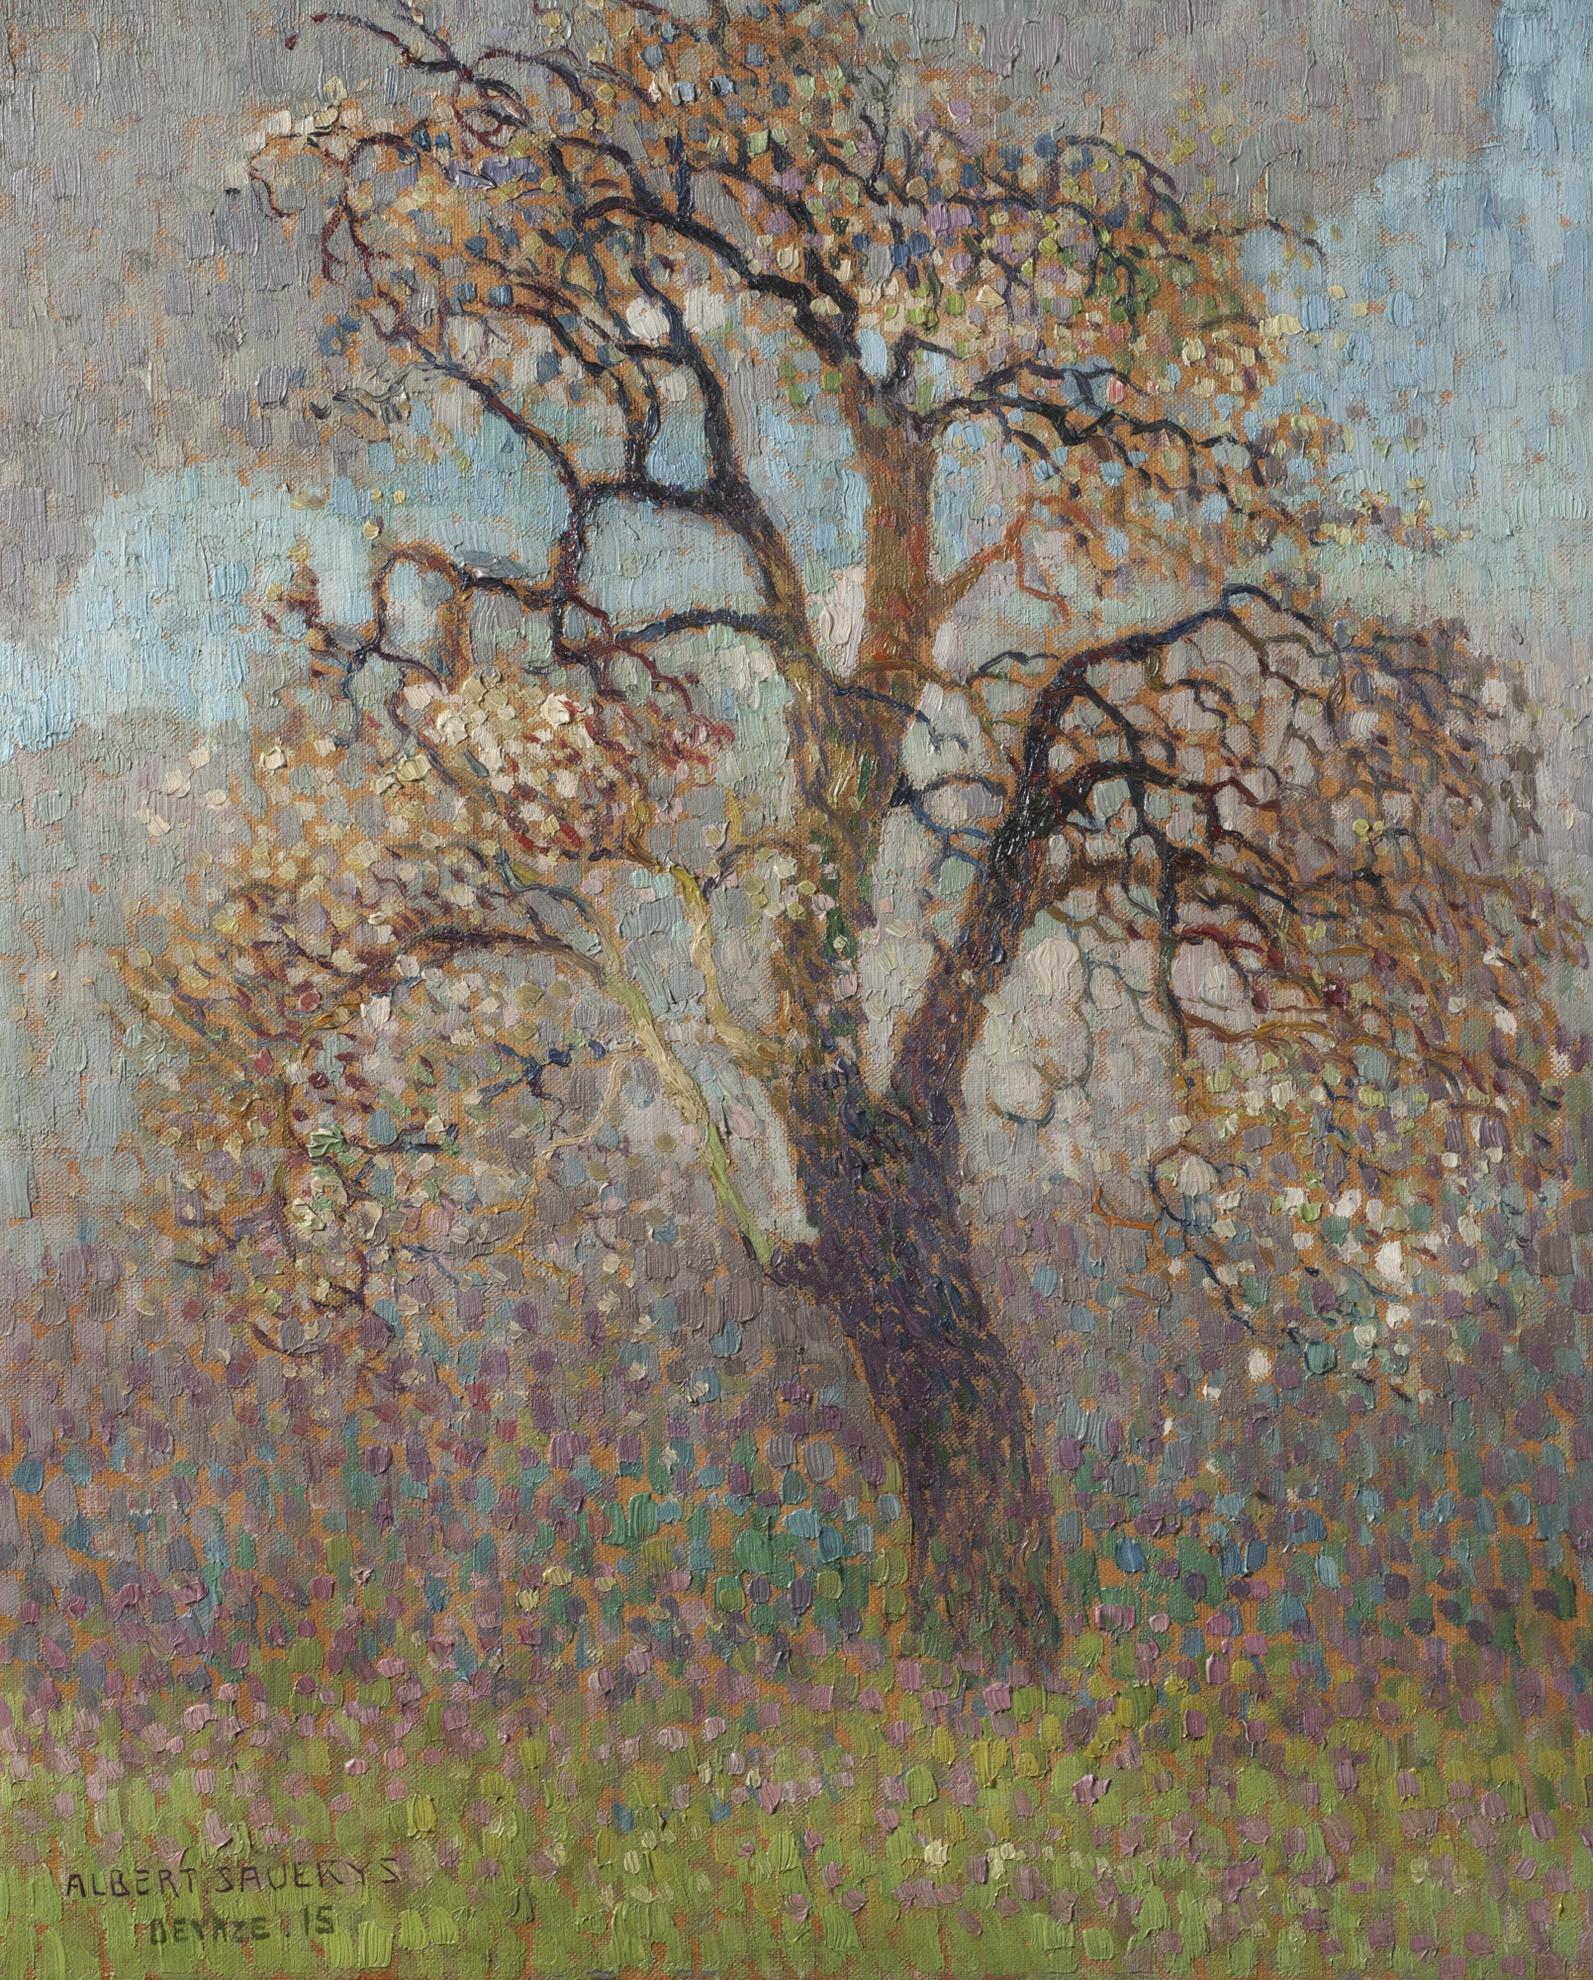 Albert Saverys - Arbre-1915